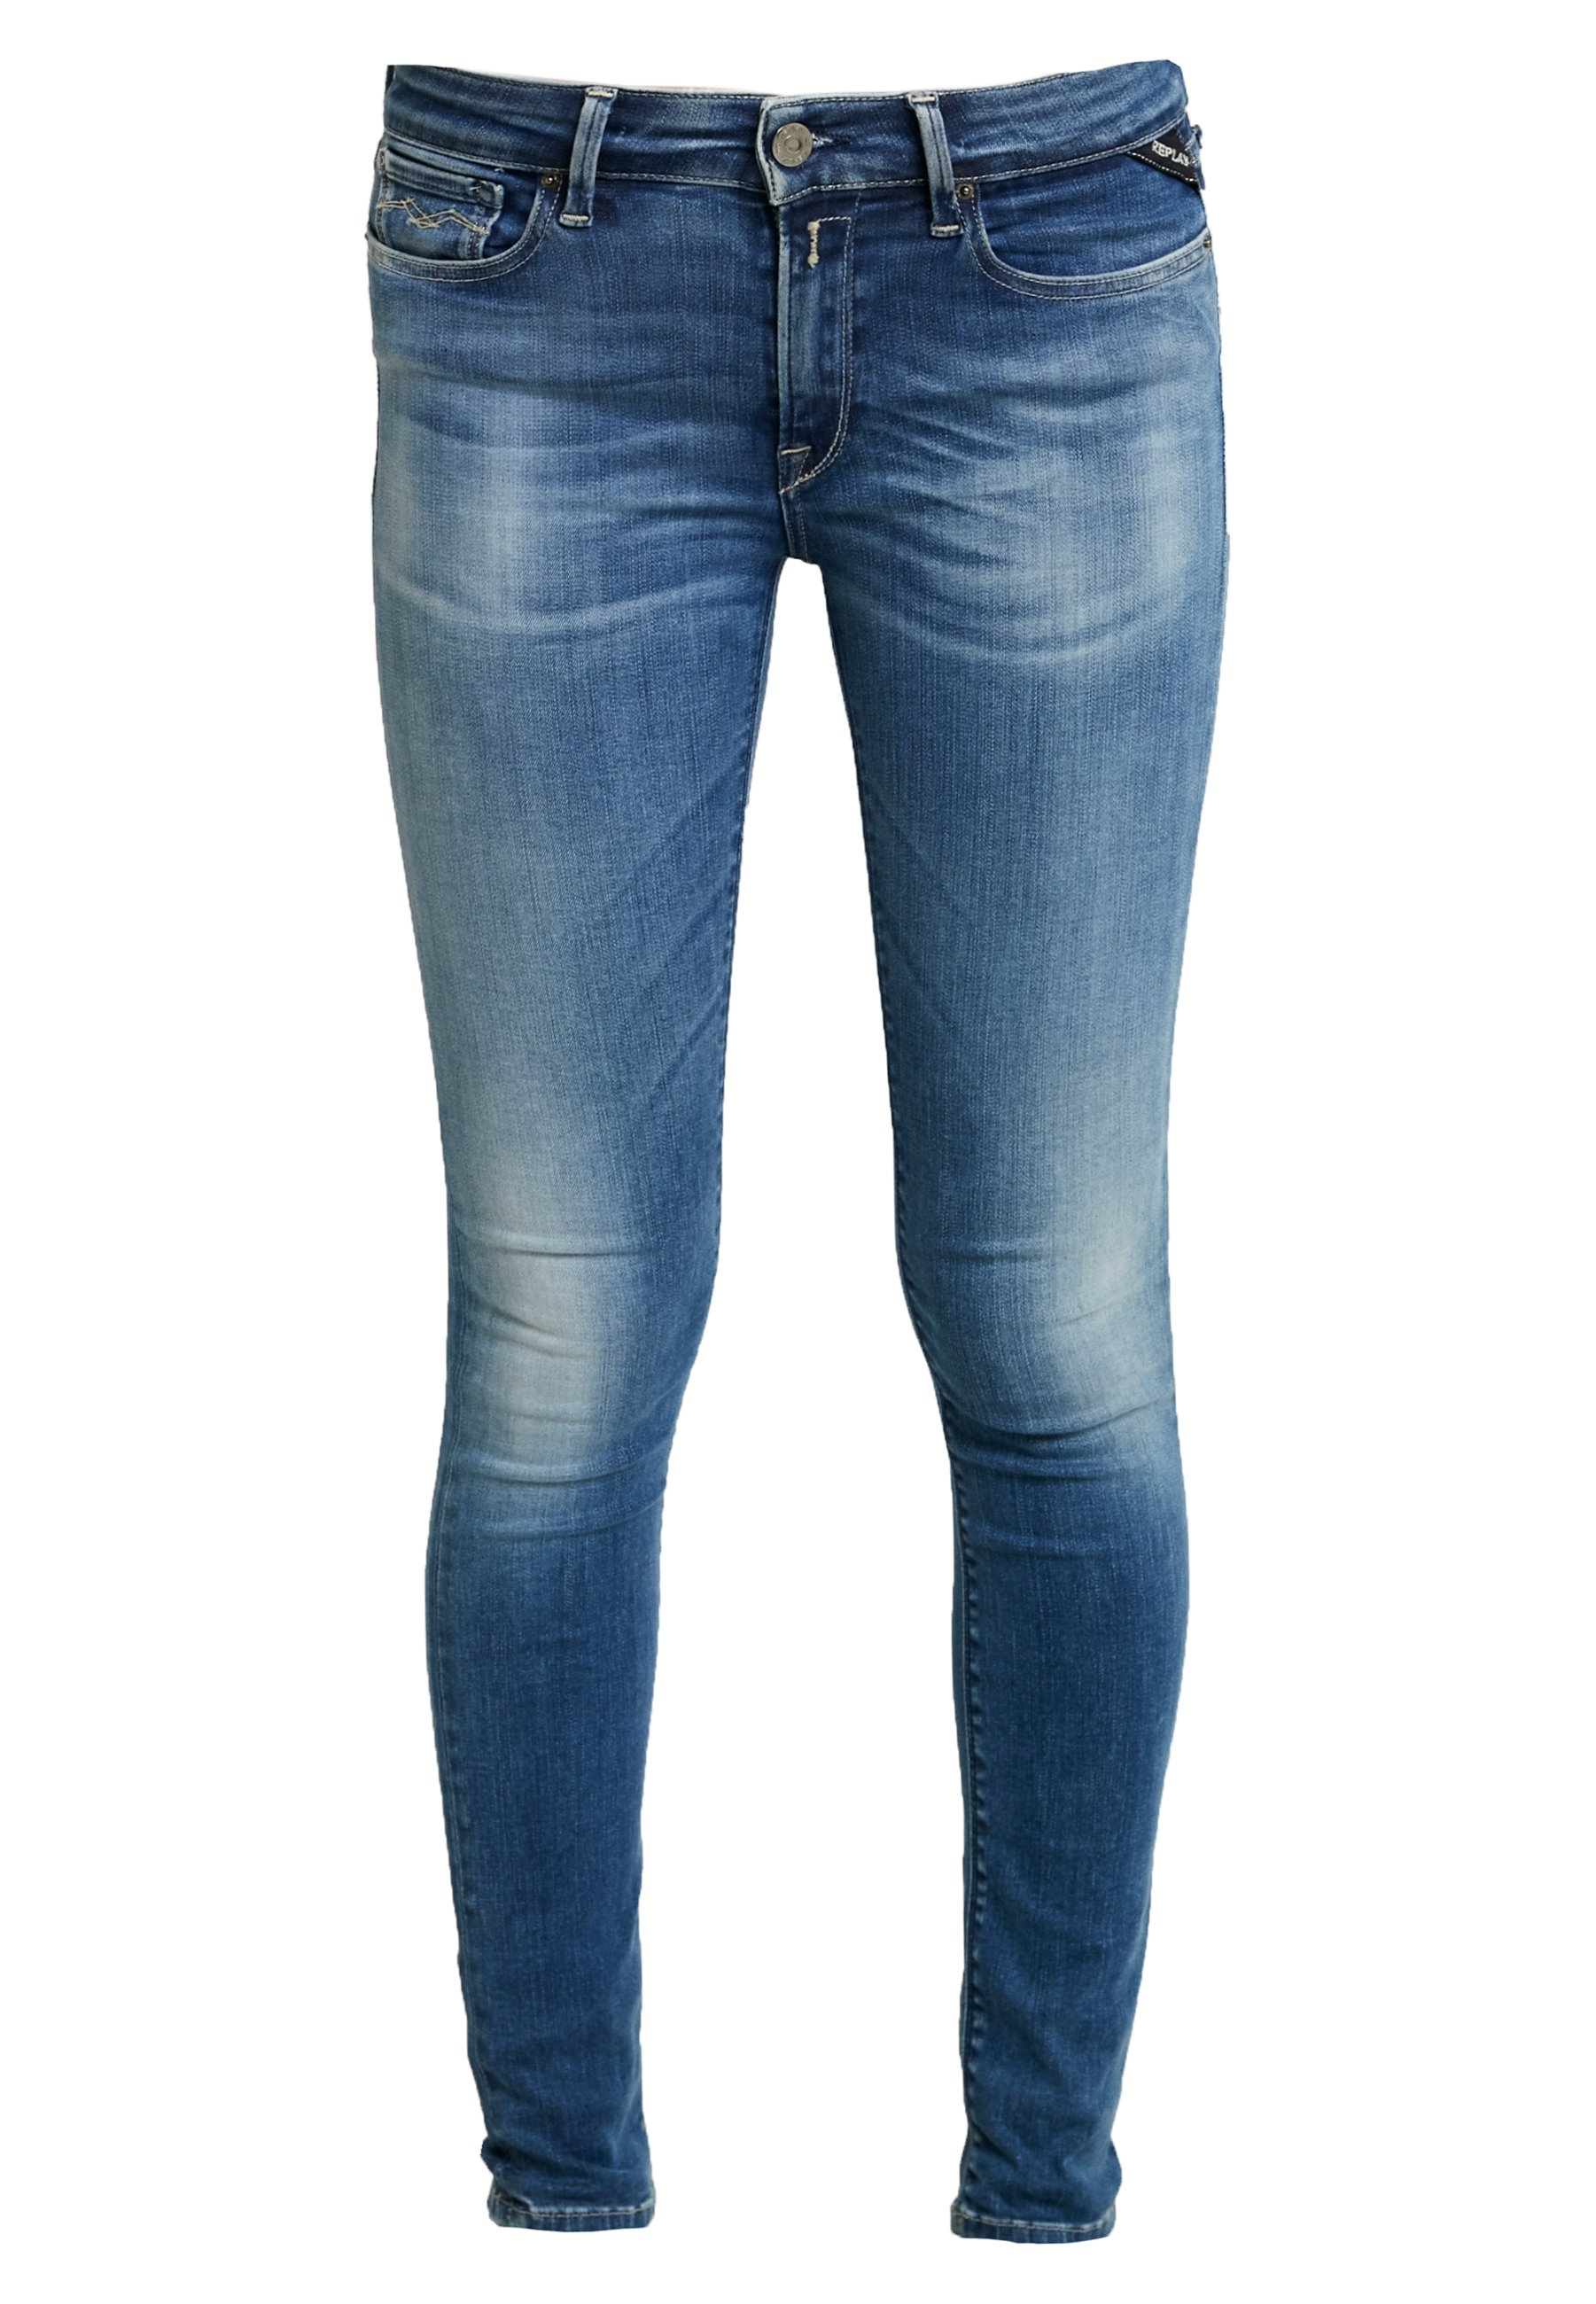 Replay Newluz Hyperflex - Jeans Skinny Fit Mediumblue 8JTit8B